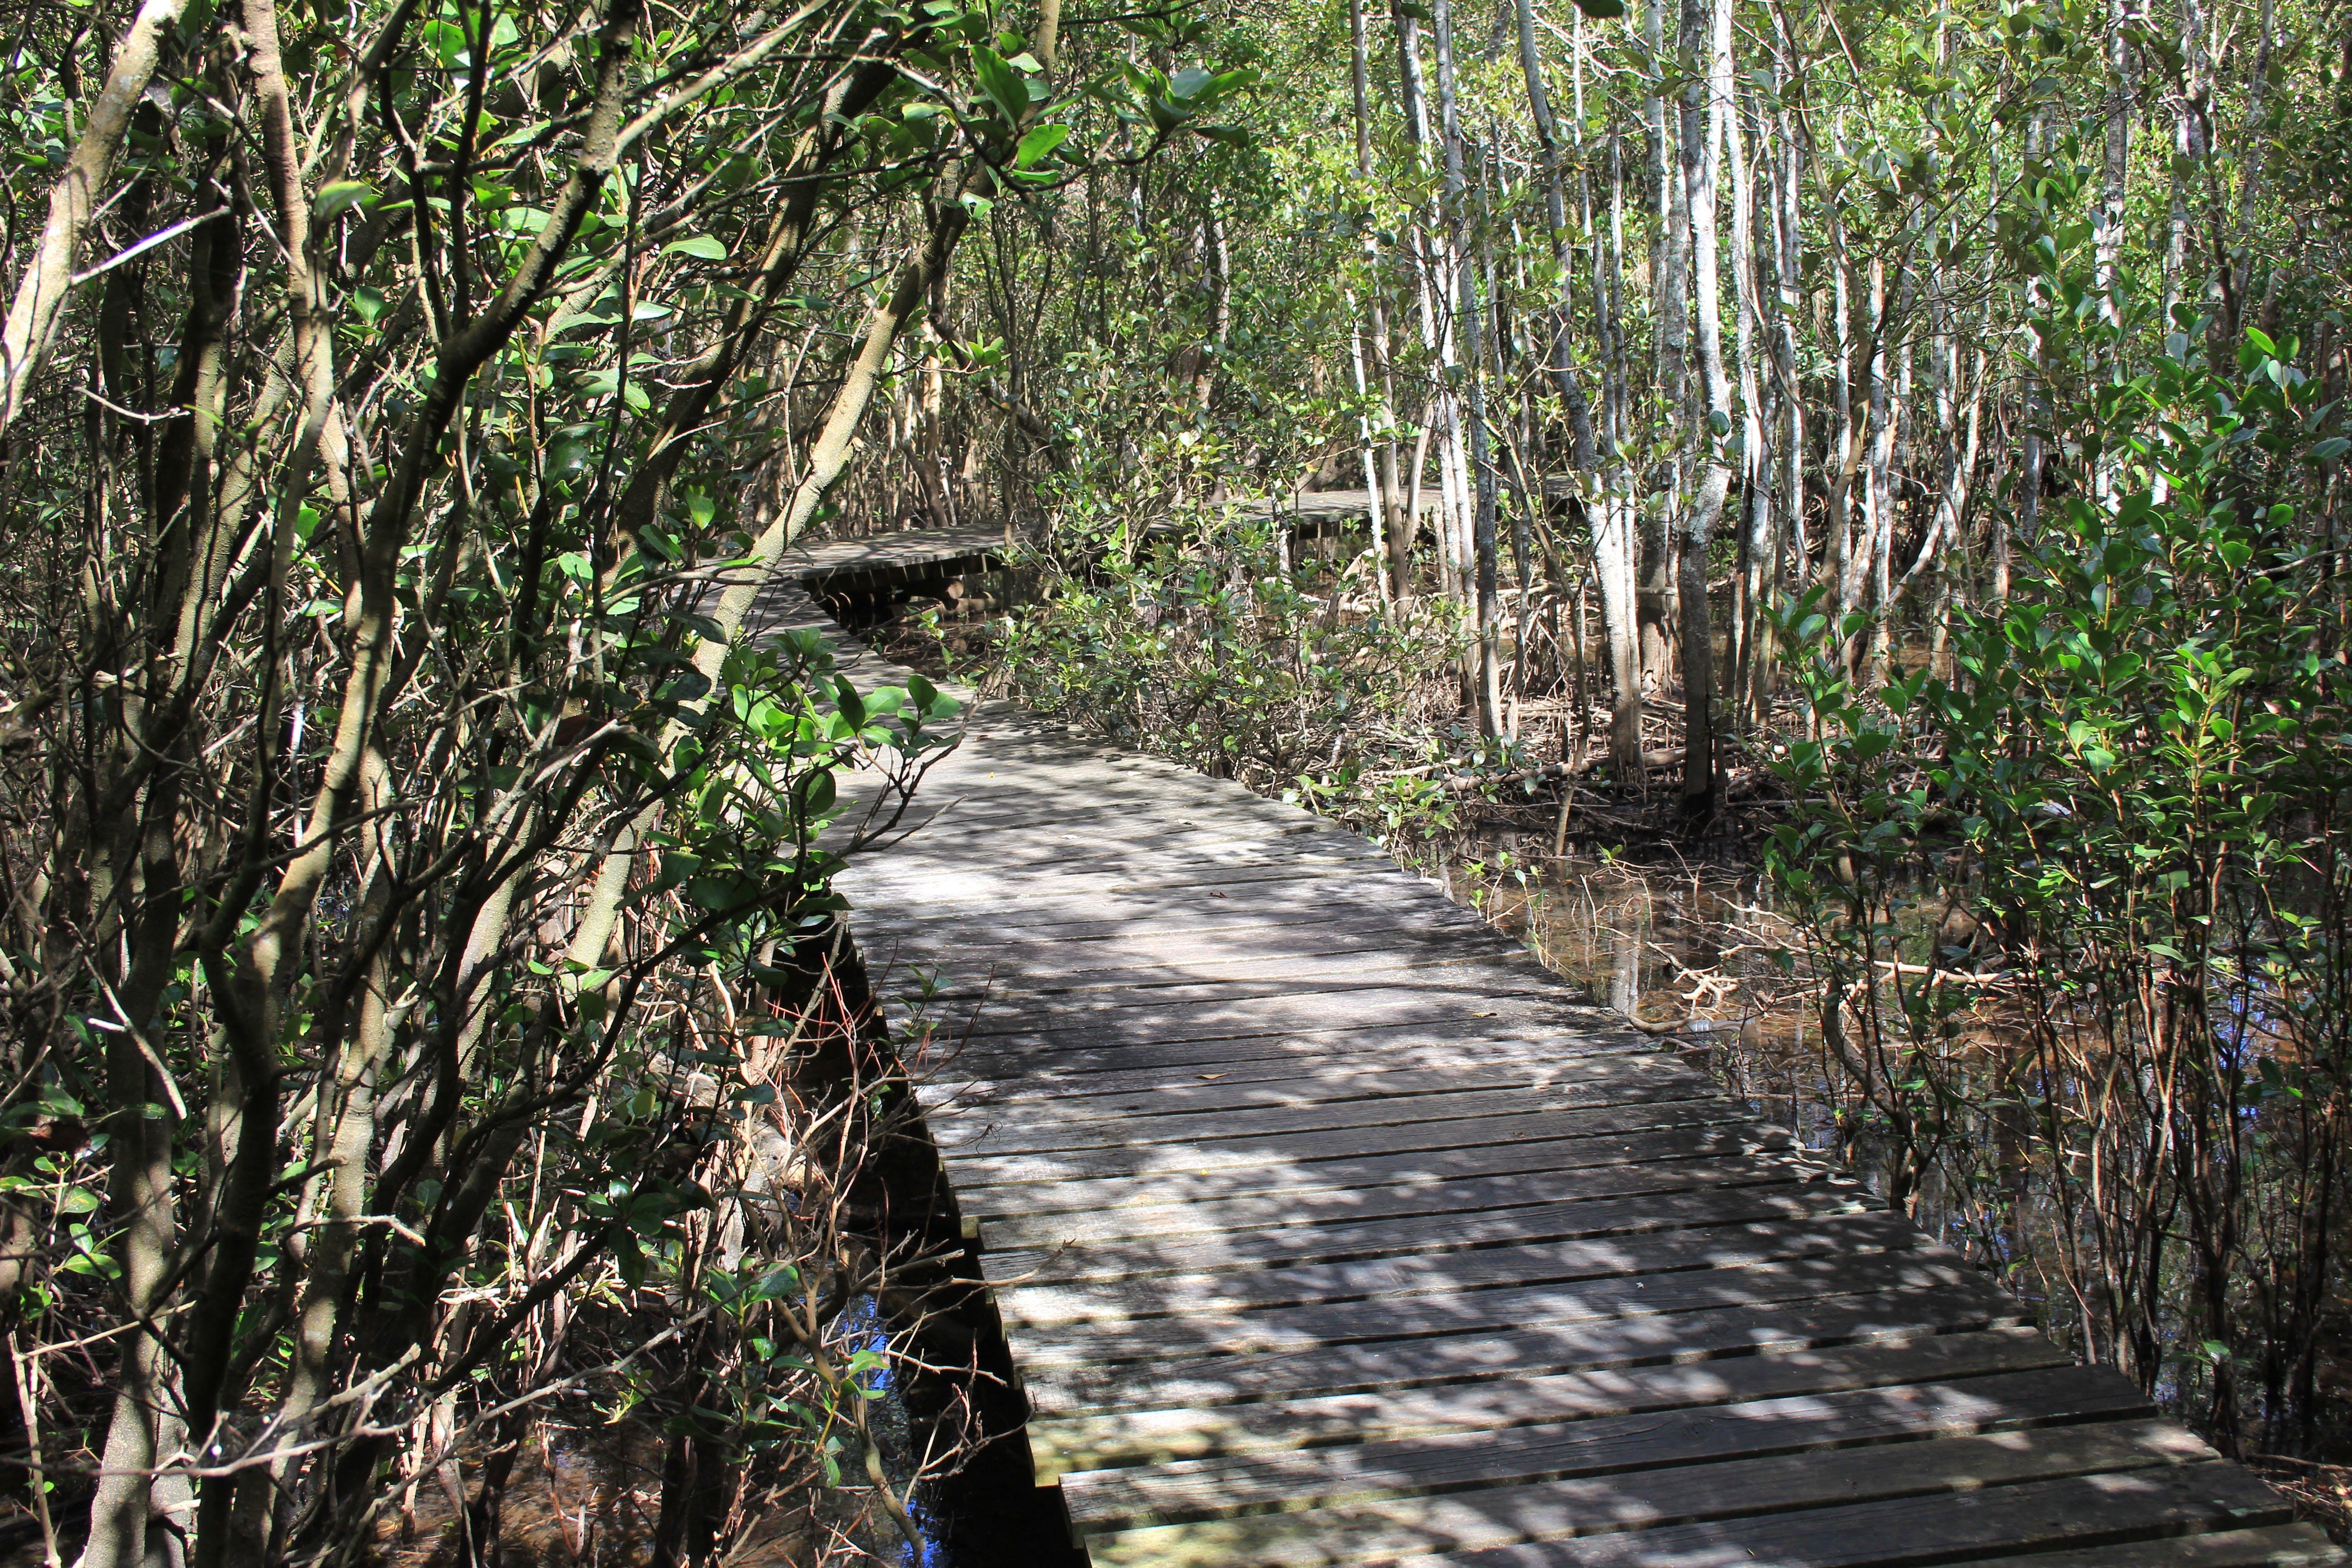 Kooloonbung Creek walking track